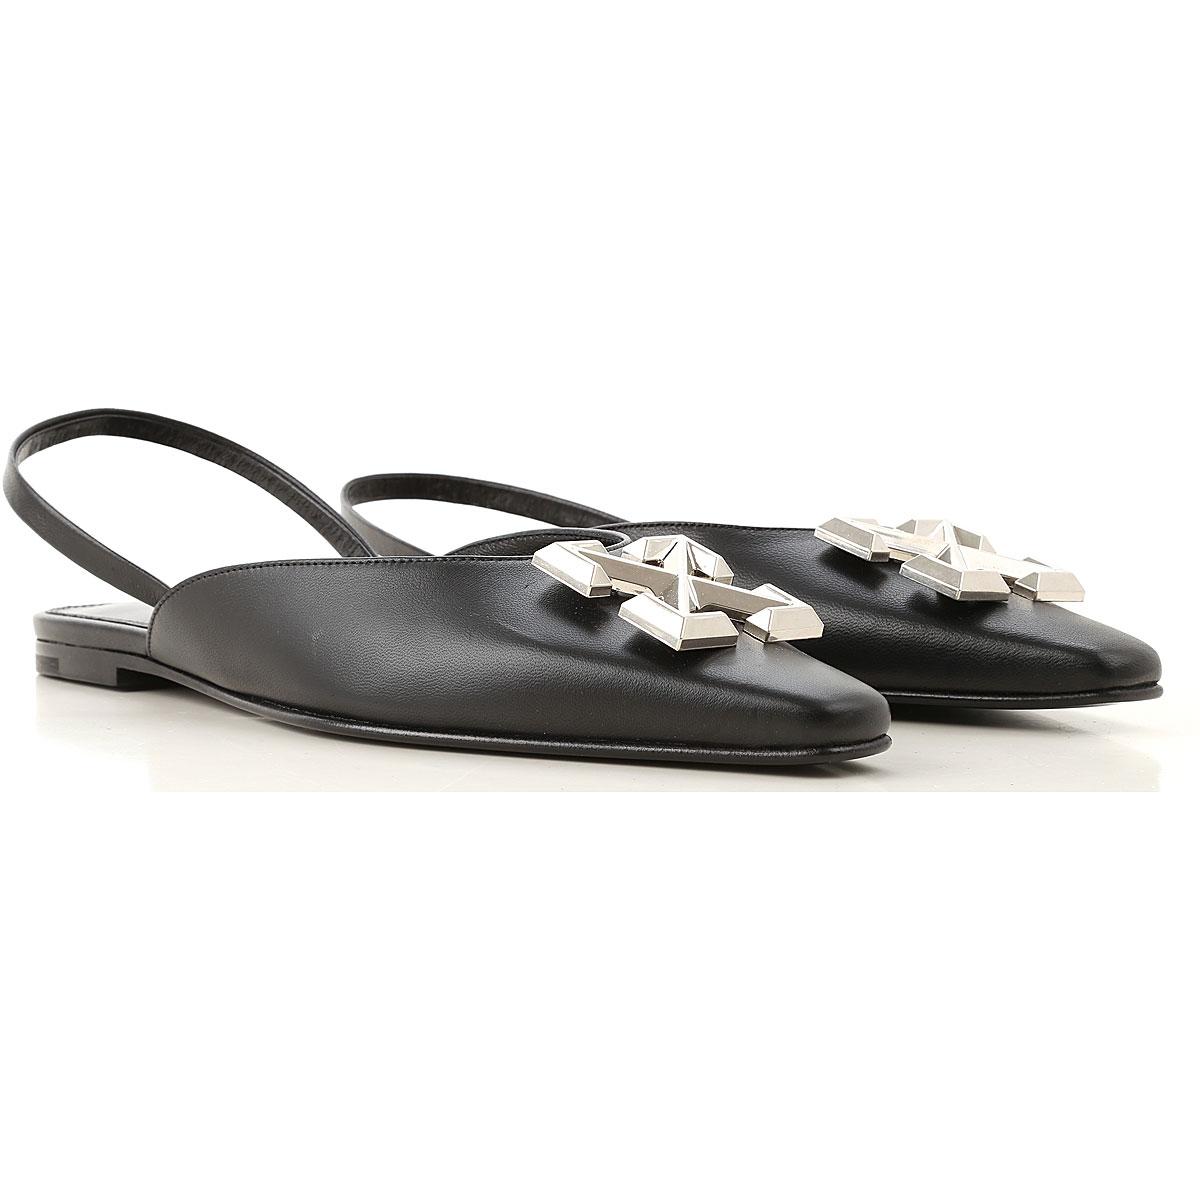 Off-White Virgil Abloh Sandals for Women On Sale, Black, Leather, 2019, 5 7